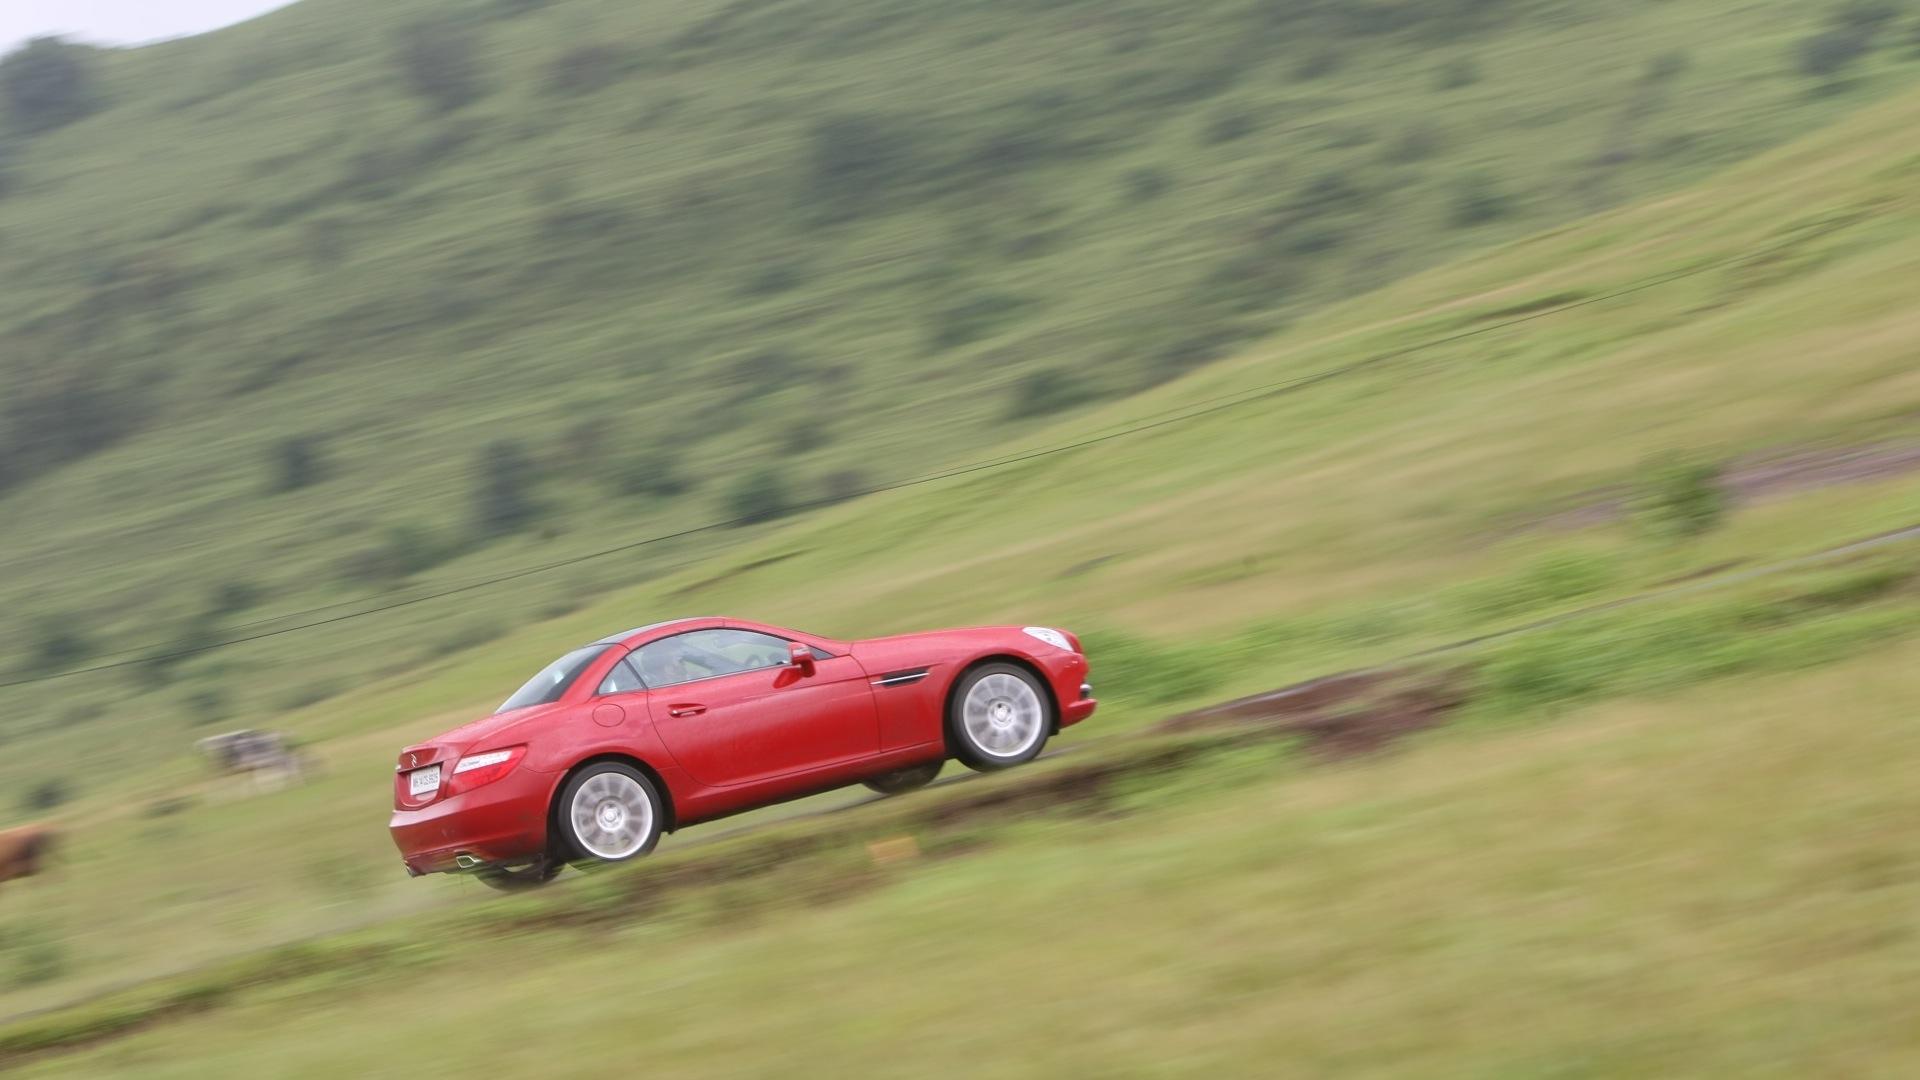 MercedesBenz-SLK-2013-350-Exterior Car Photos - Overdrive